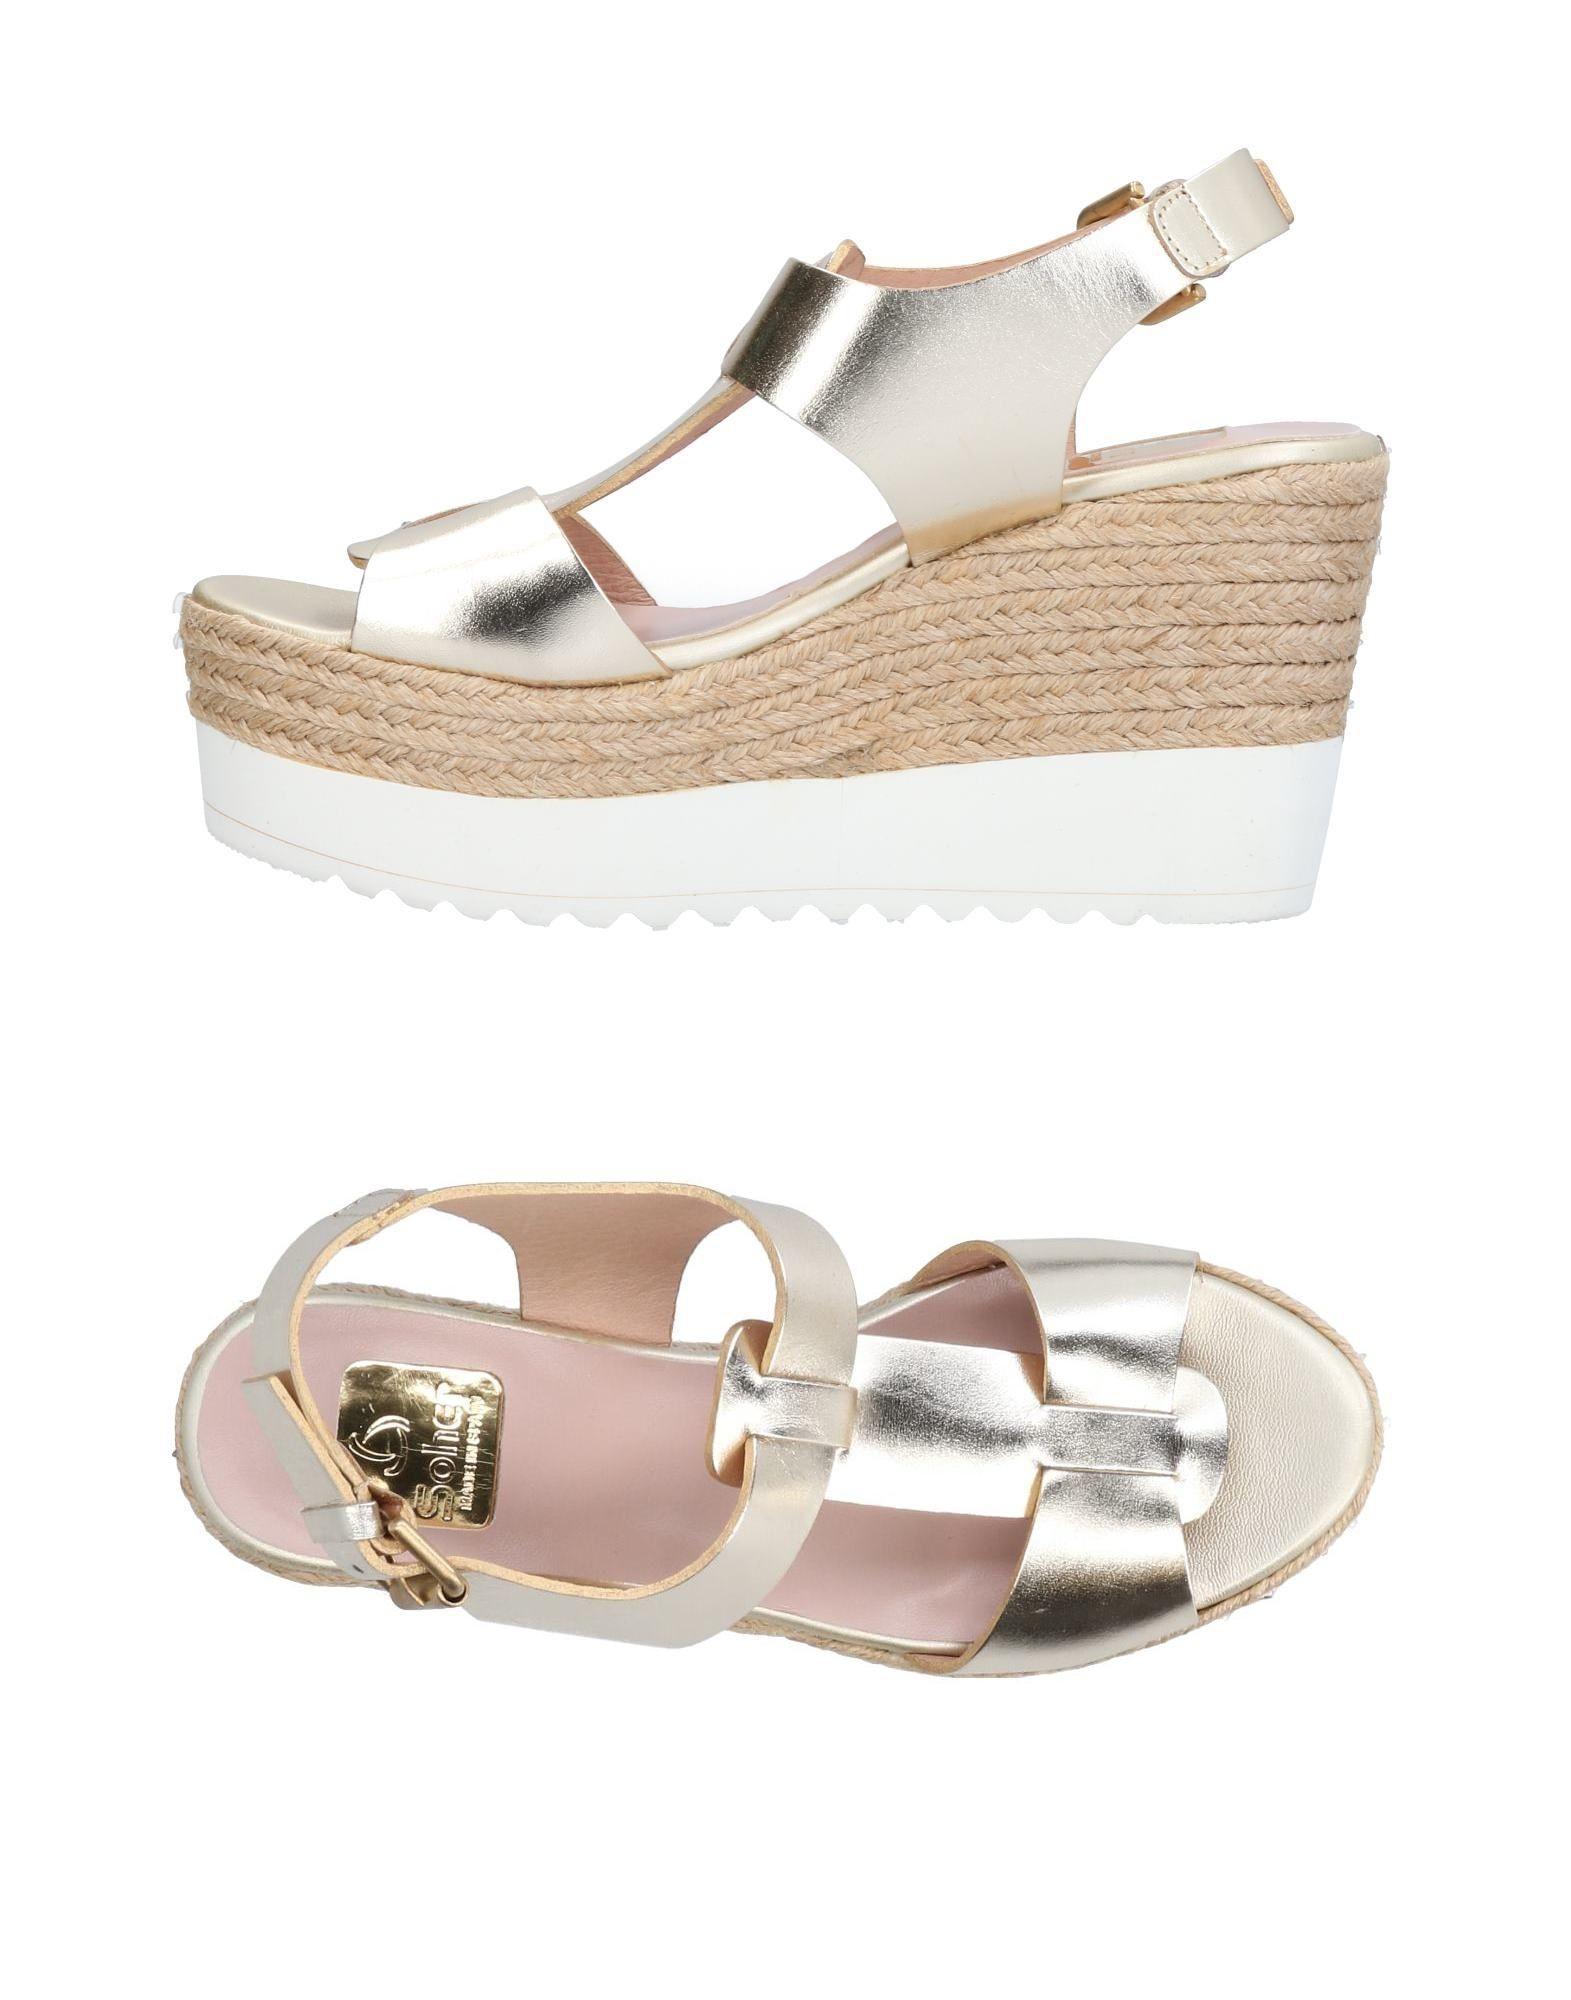 Soher Sandalen Damen  11460529GJ Gute Qualität beliebte Schuhe